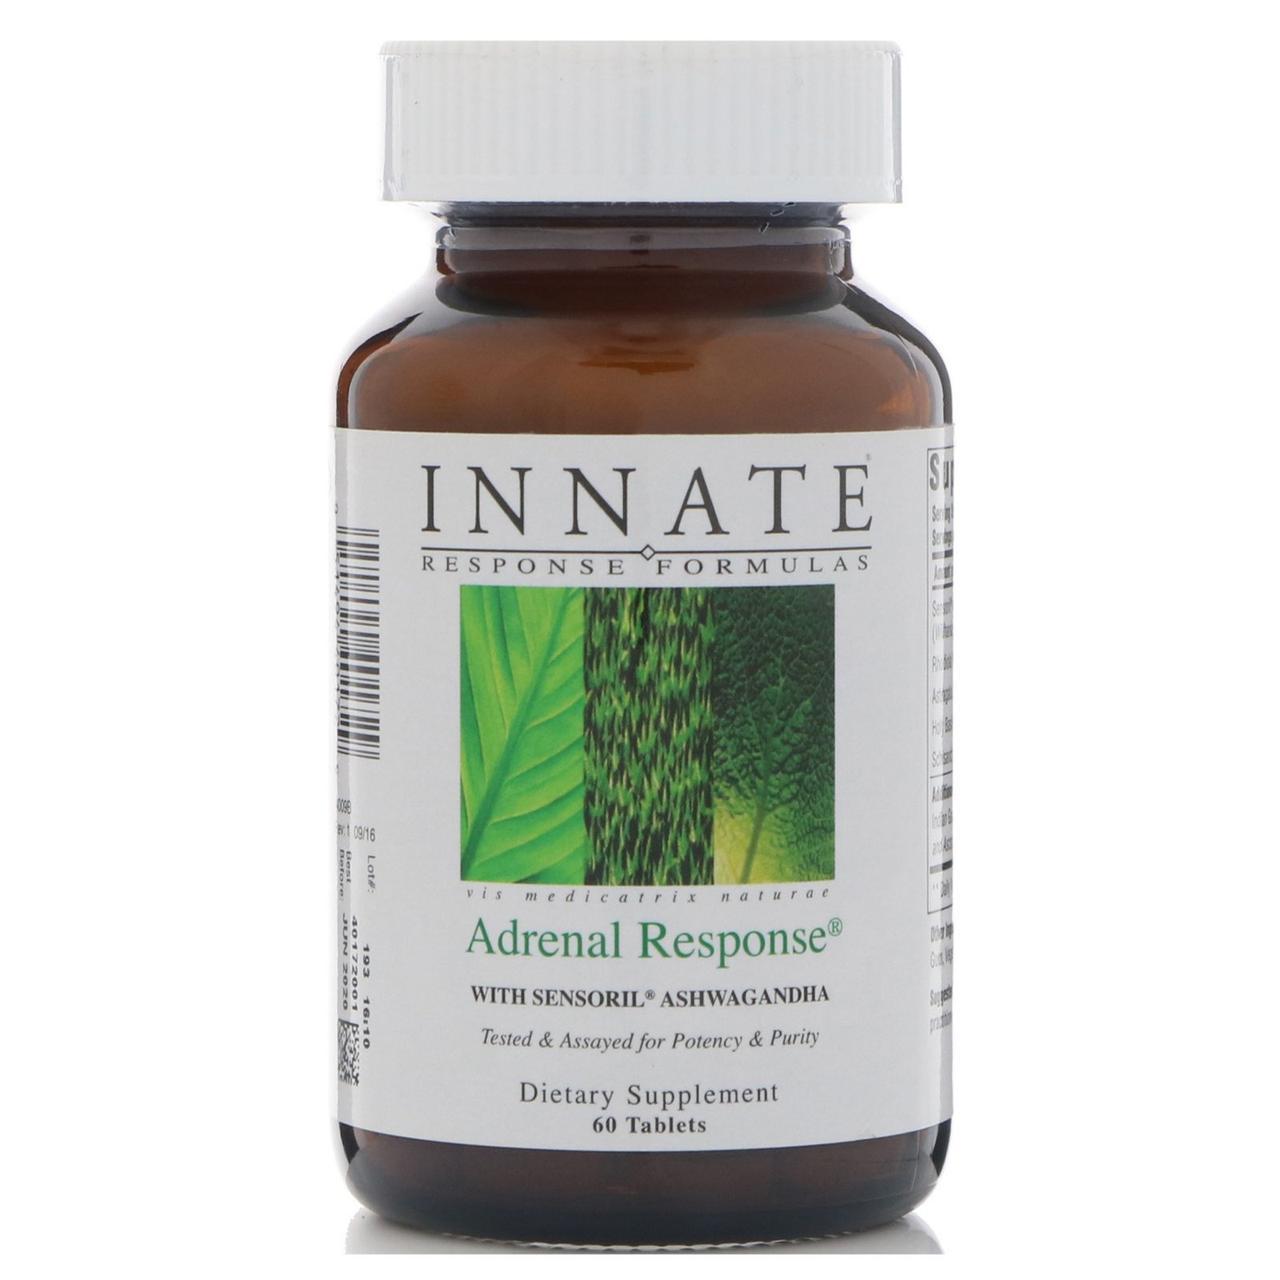 Innate Response Formulas, Adrenal Response, 60 таблеток